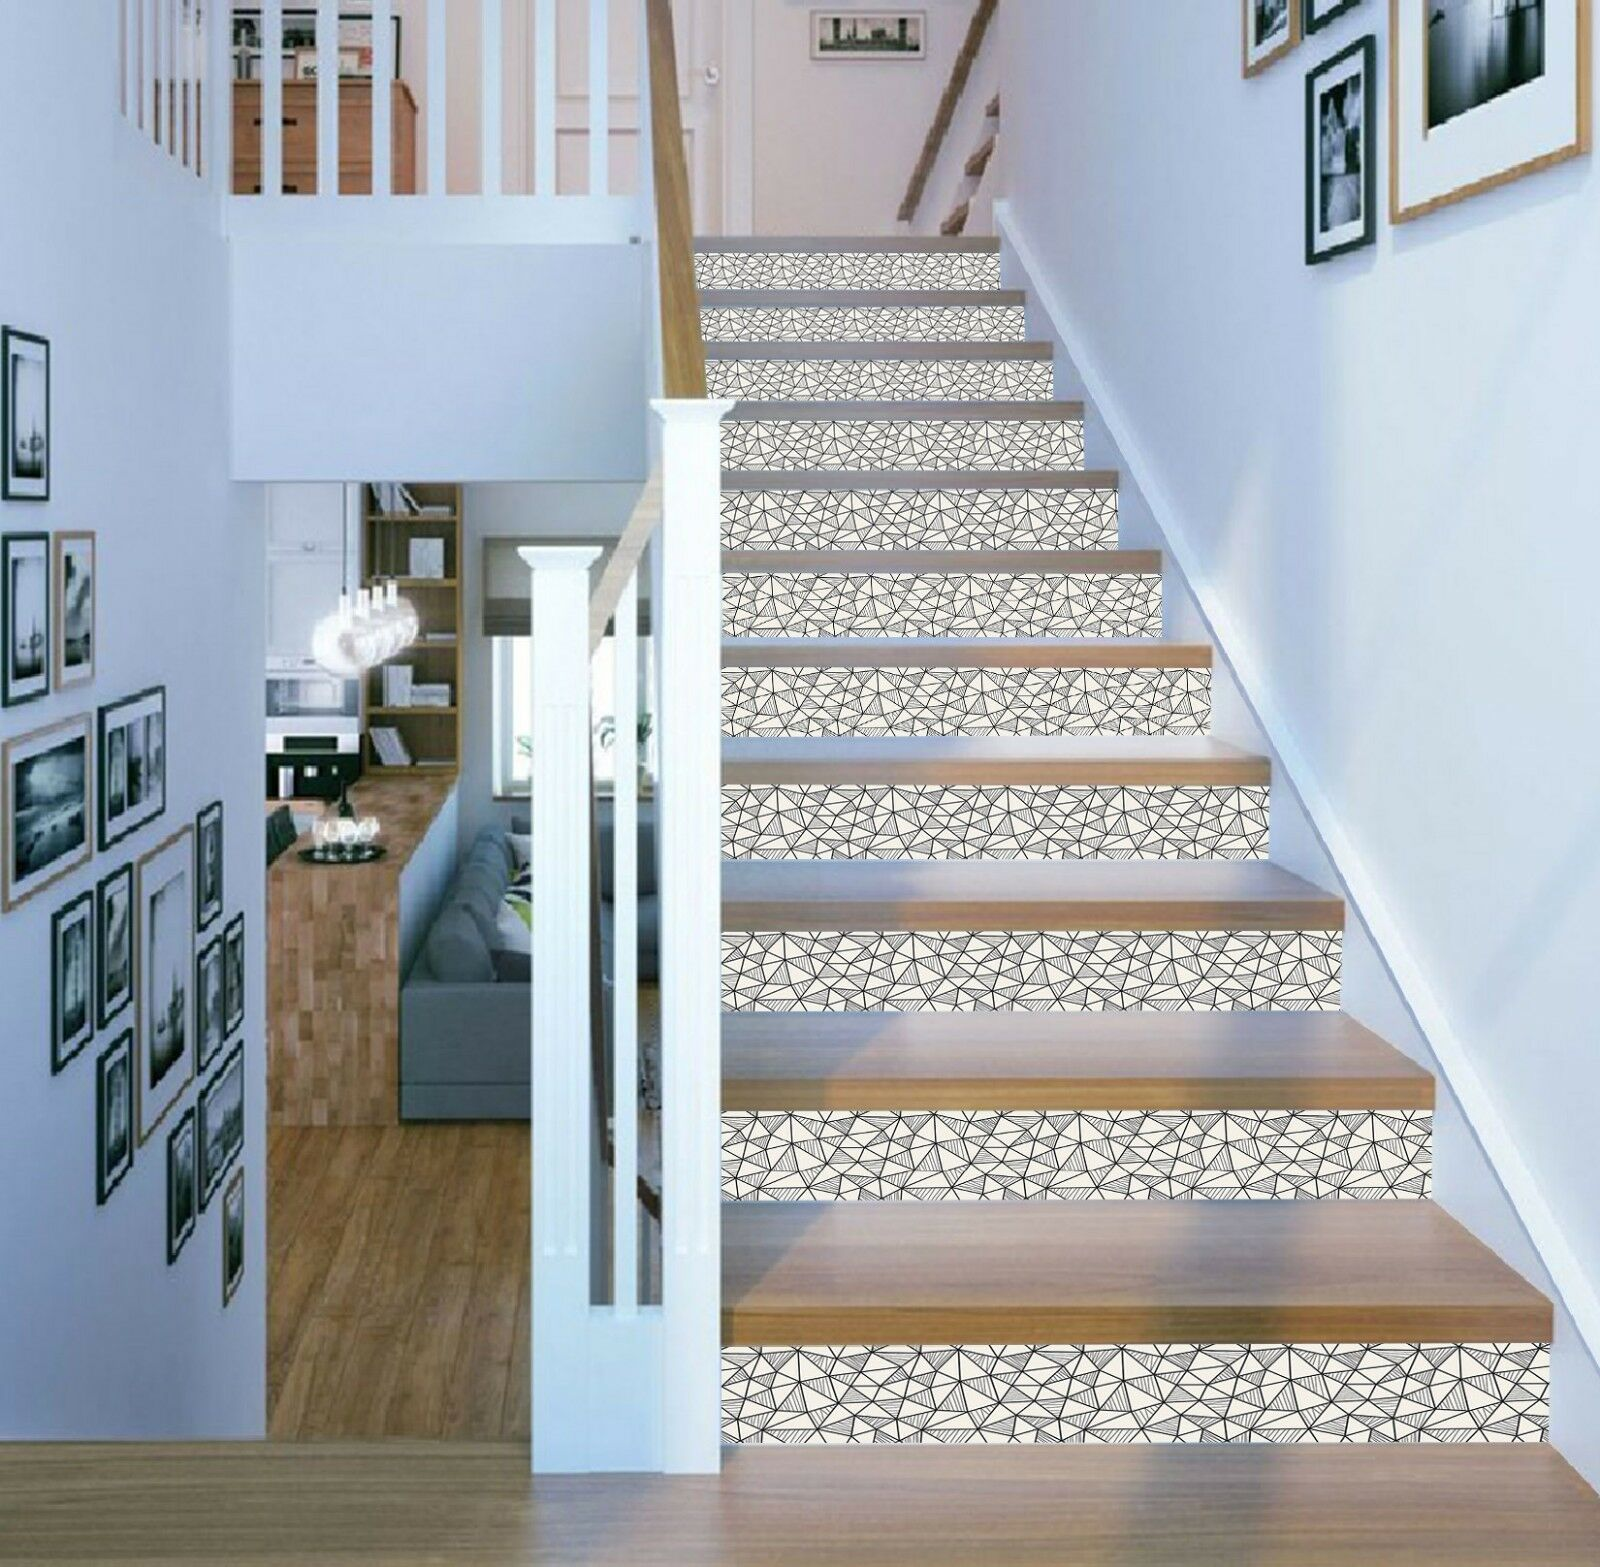 3D Triangle Line Art 1 Tile Marble Stair Risers Decoration Vinyl Wallpaper Mural